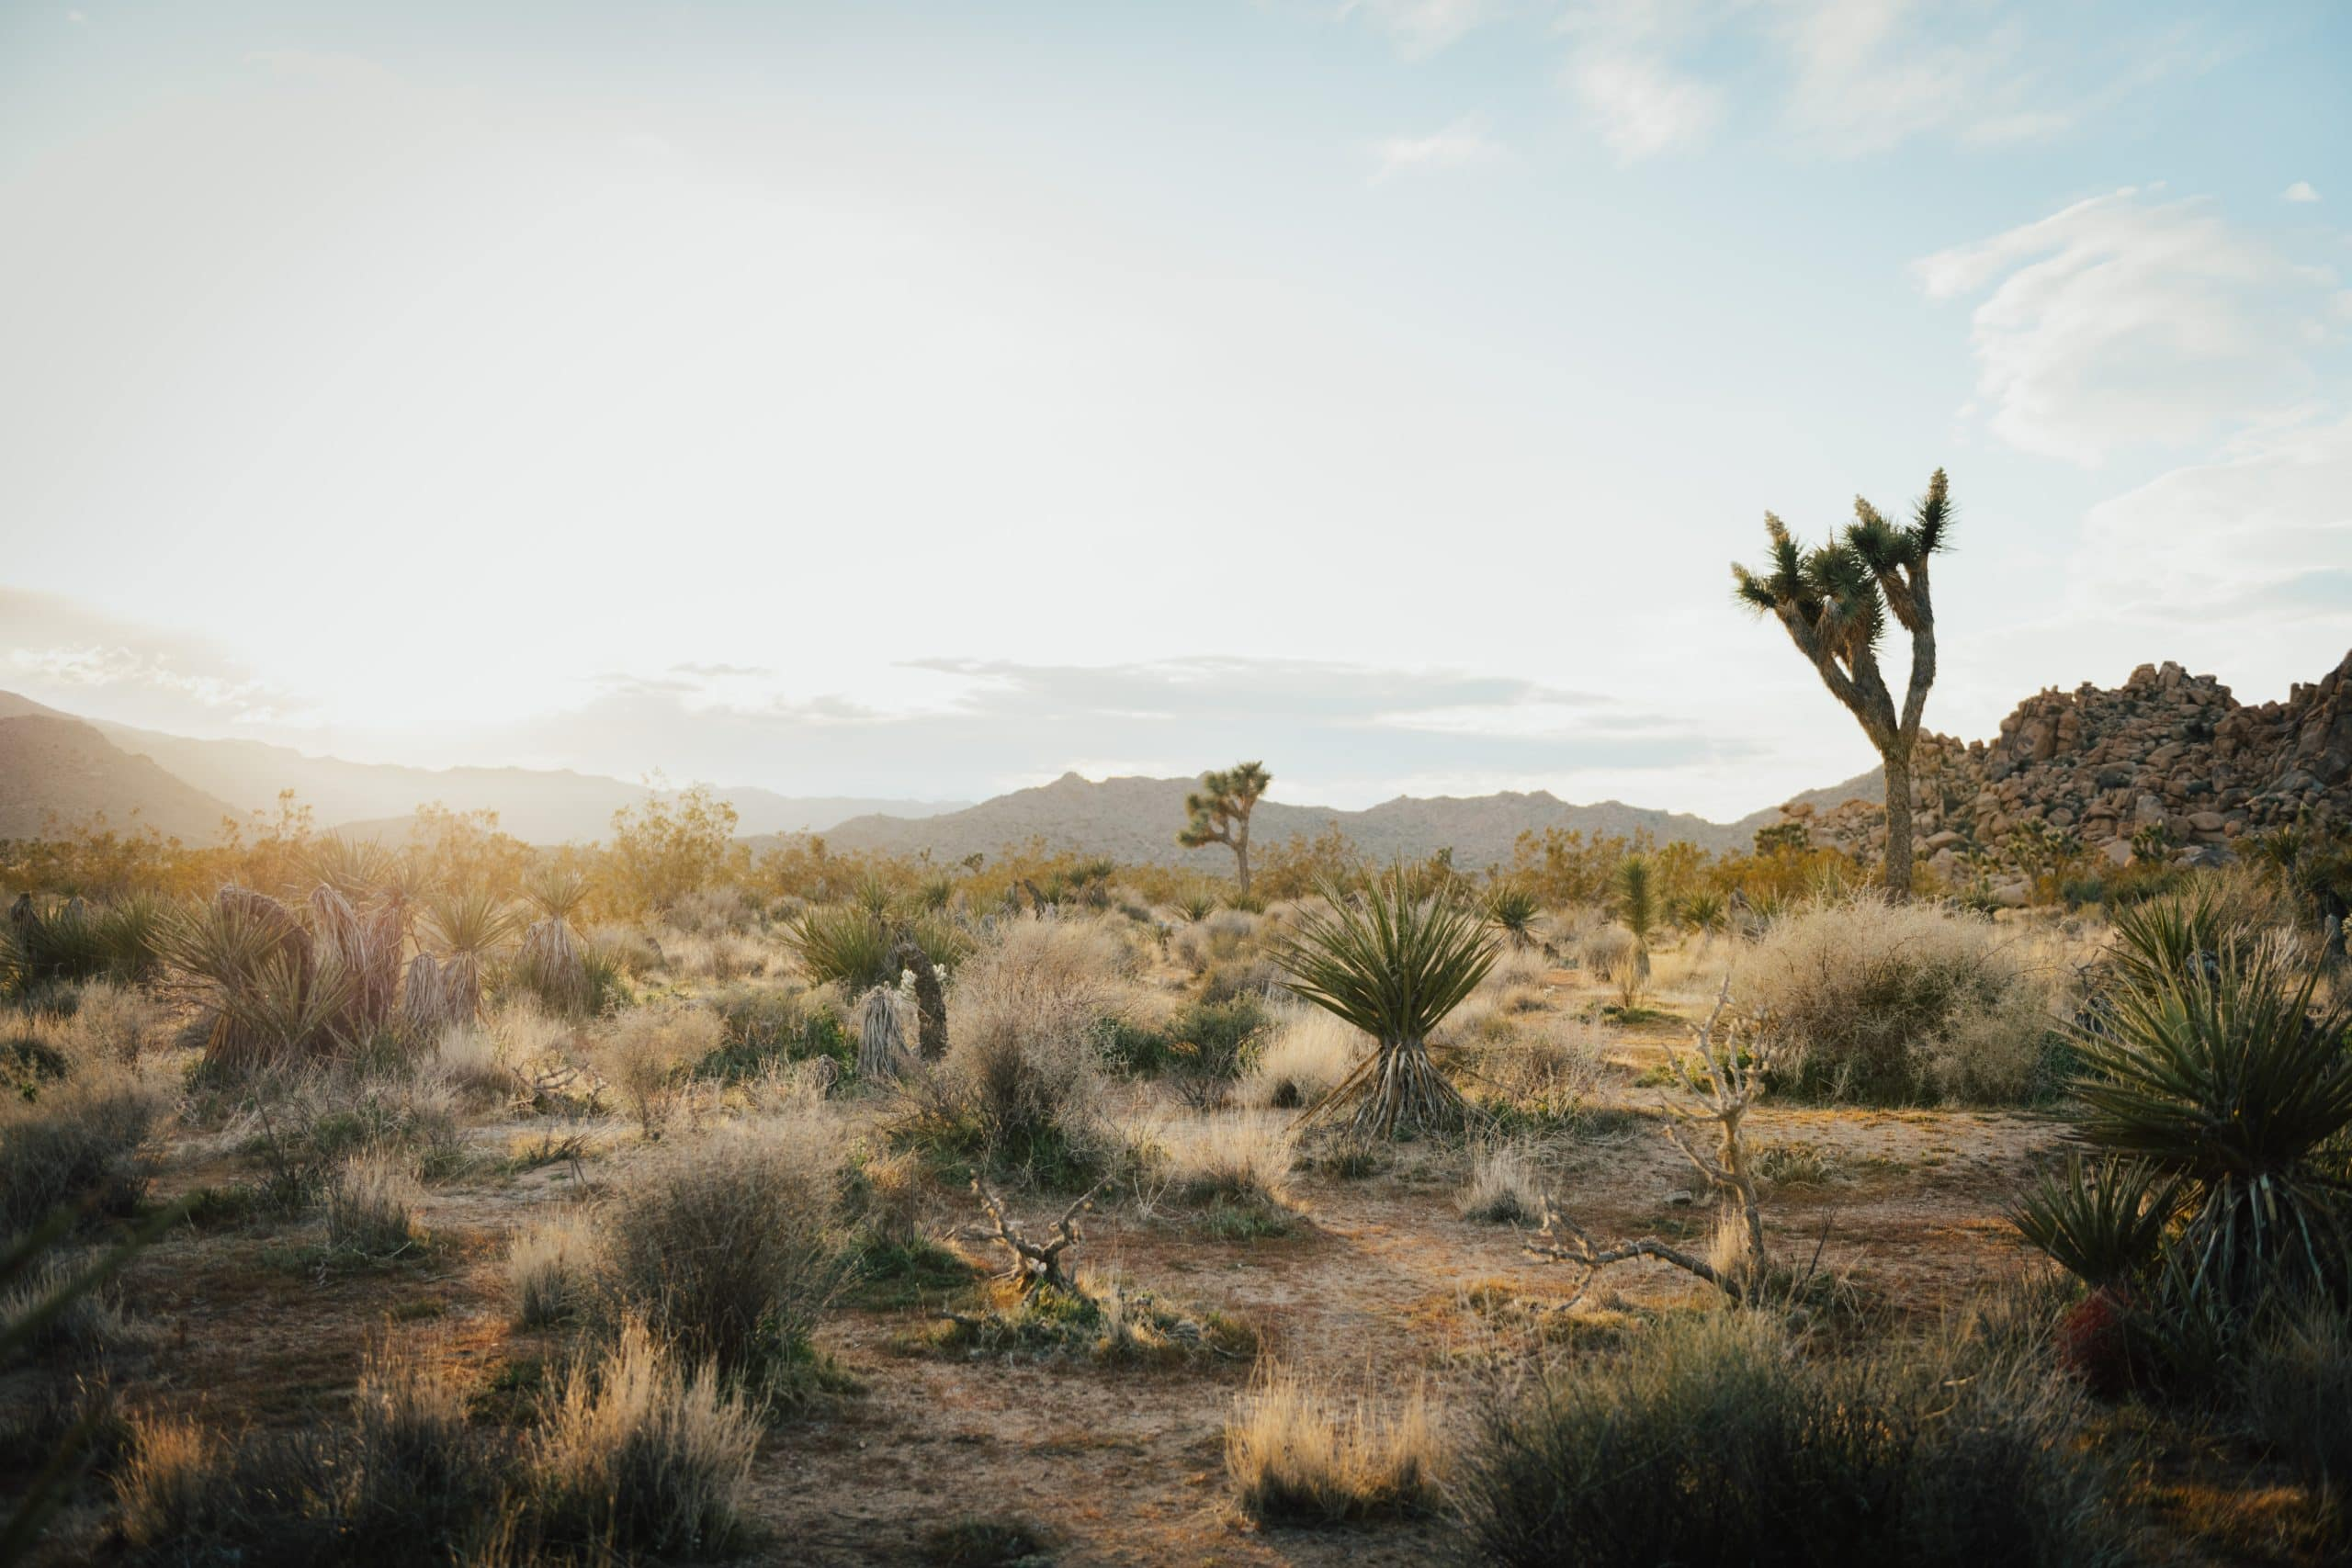 Joshua Tree desert in California.